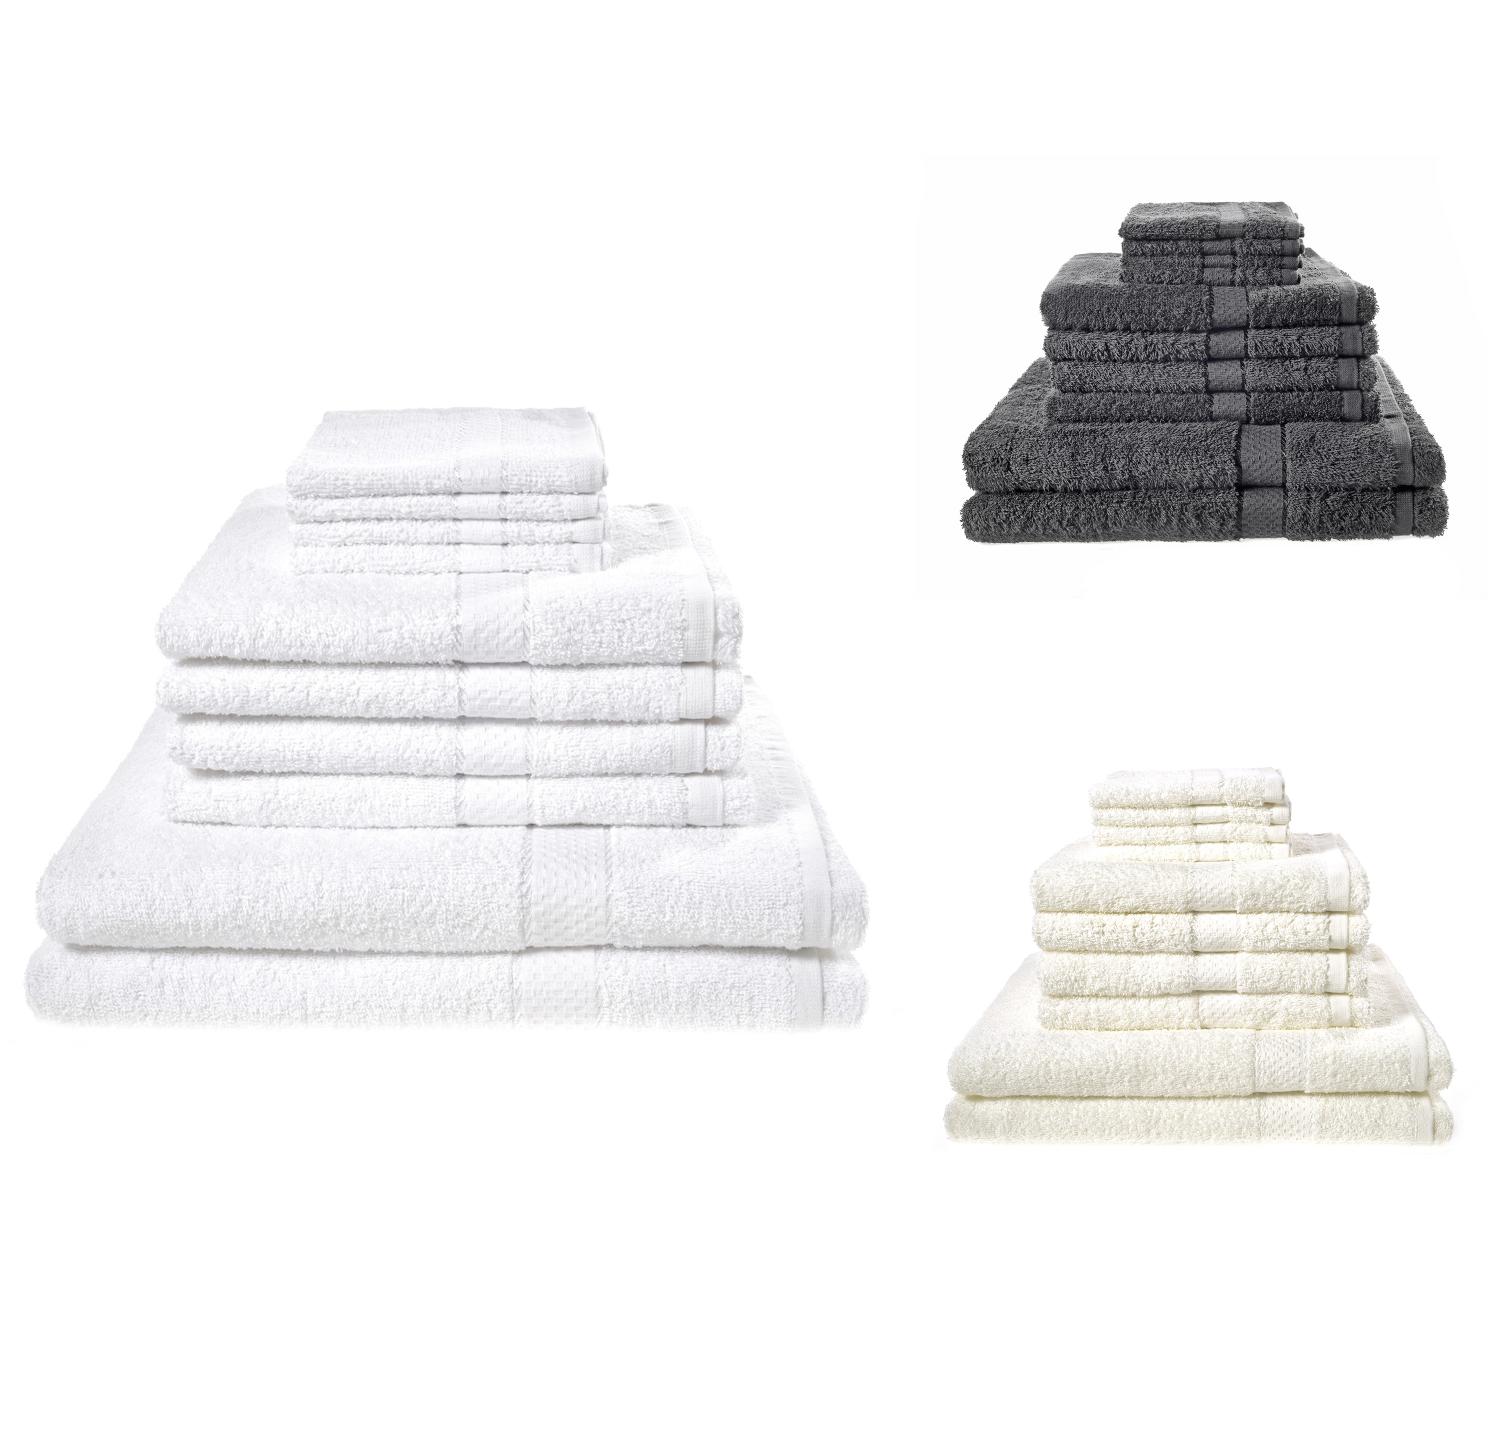 FACE HAND BATH BATHROOM TOWELS 10 PIECE TOWEL BALE SET 100/% EGYPTIAN COTTON